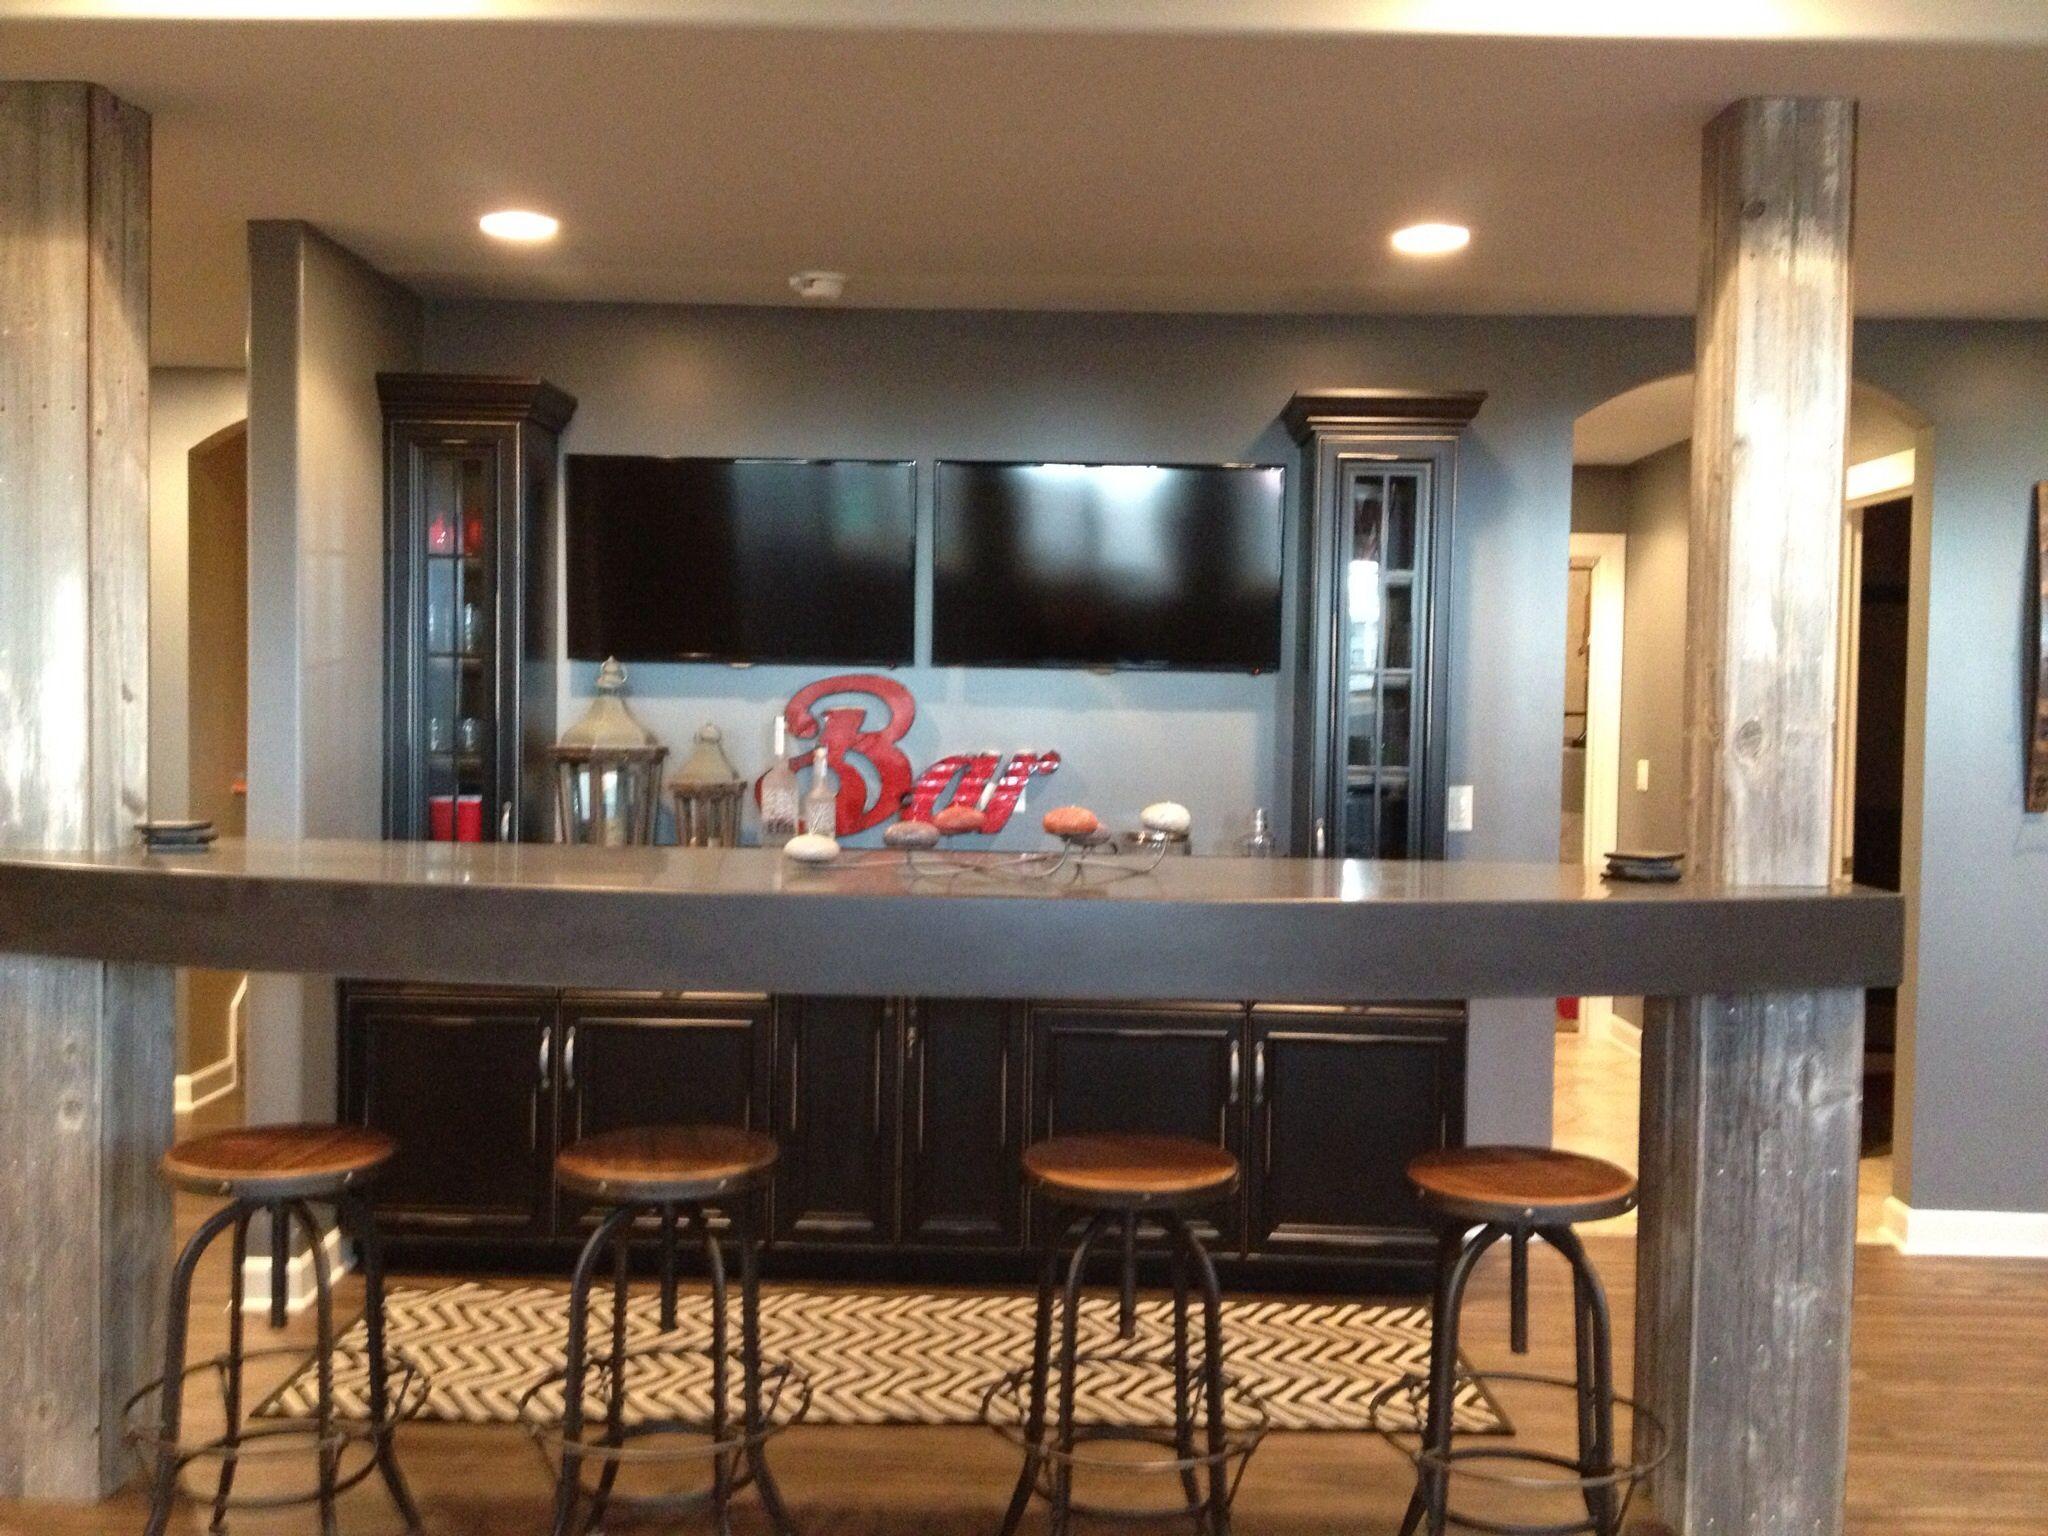 Basement Bar. Rustic meets modern. Custom cabinetry, Steelskin ...